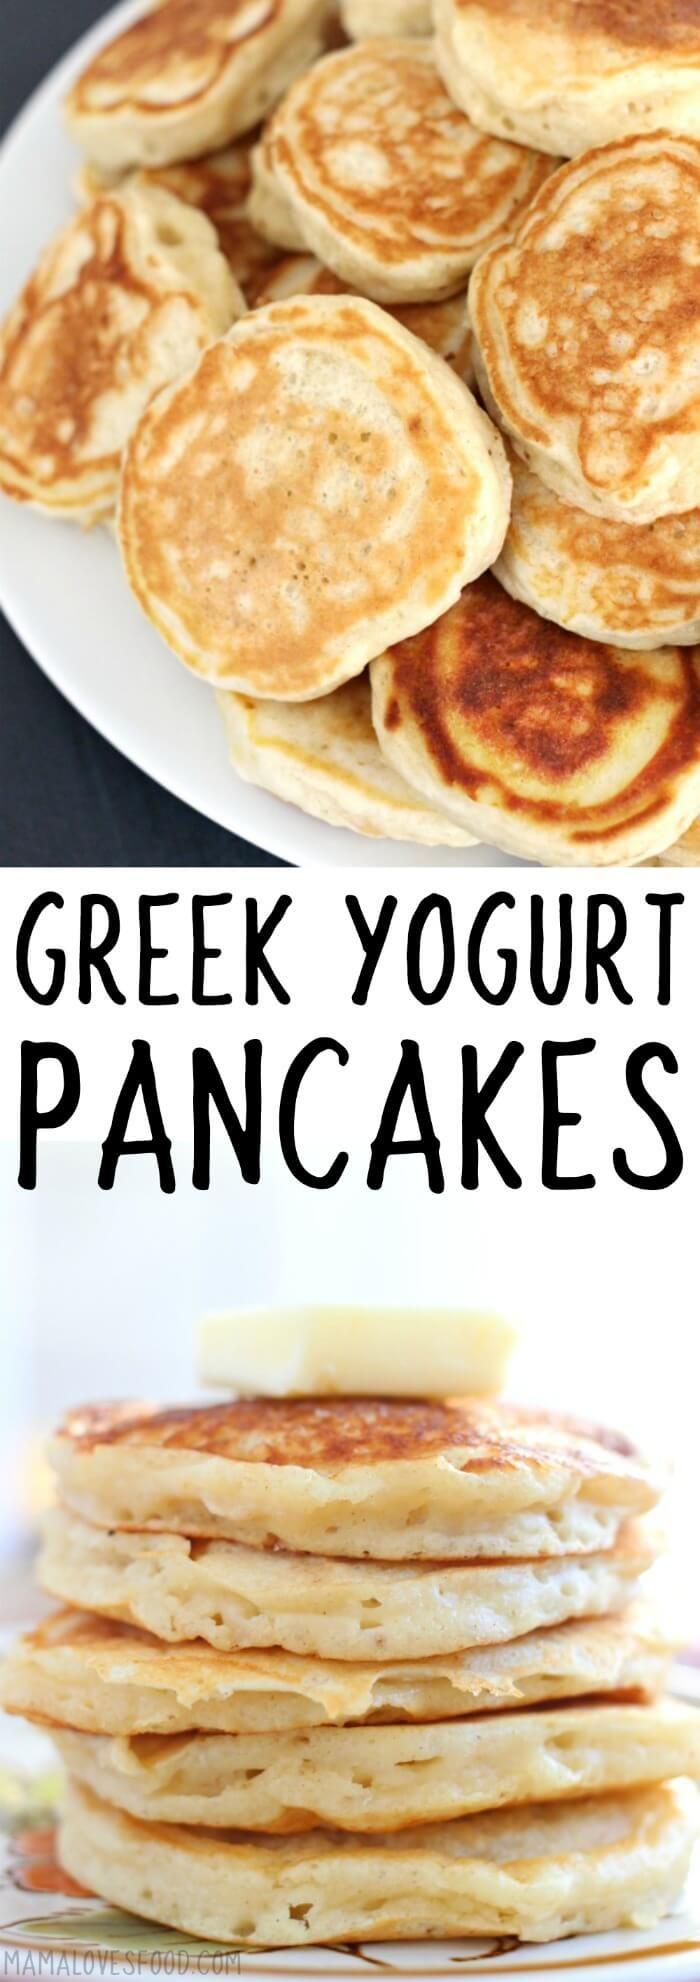 will def make again! GREEK YOGURT PANCAKES #pancakes #greekyogurt #breakfast #breakfastrecipes